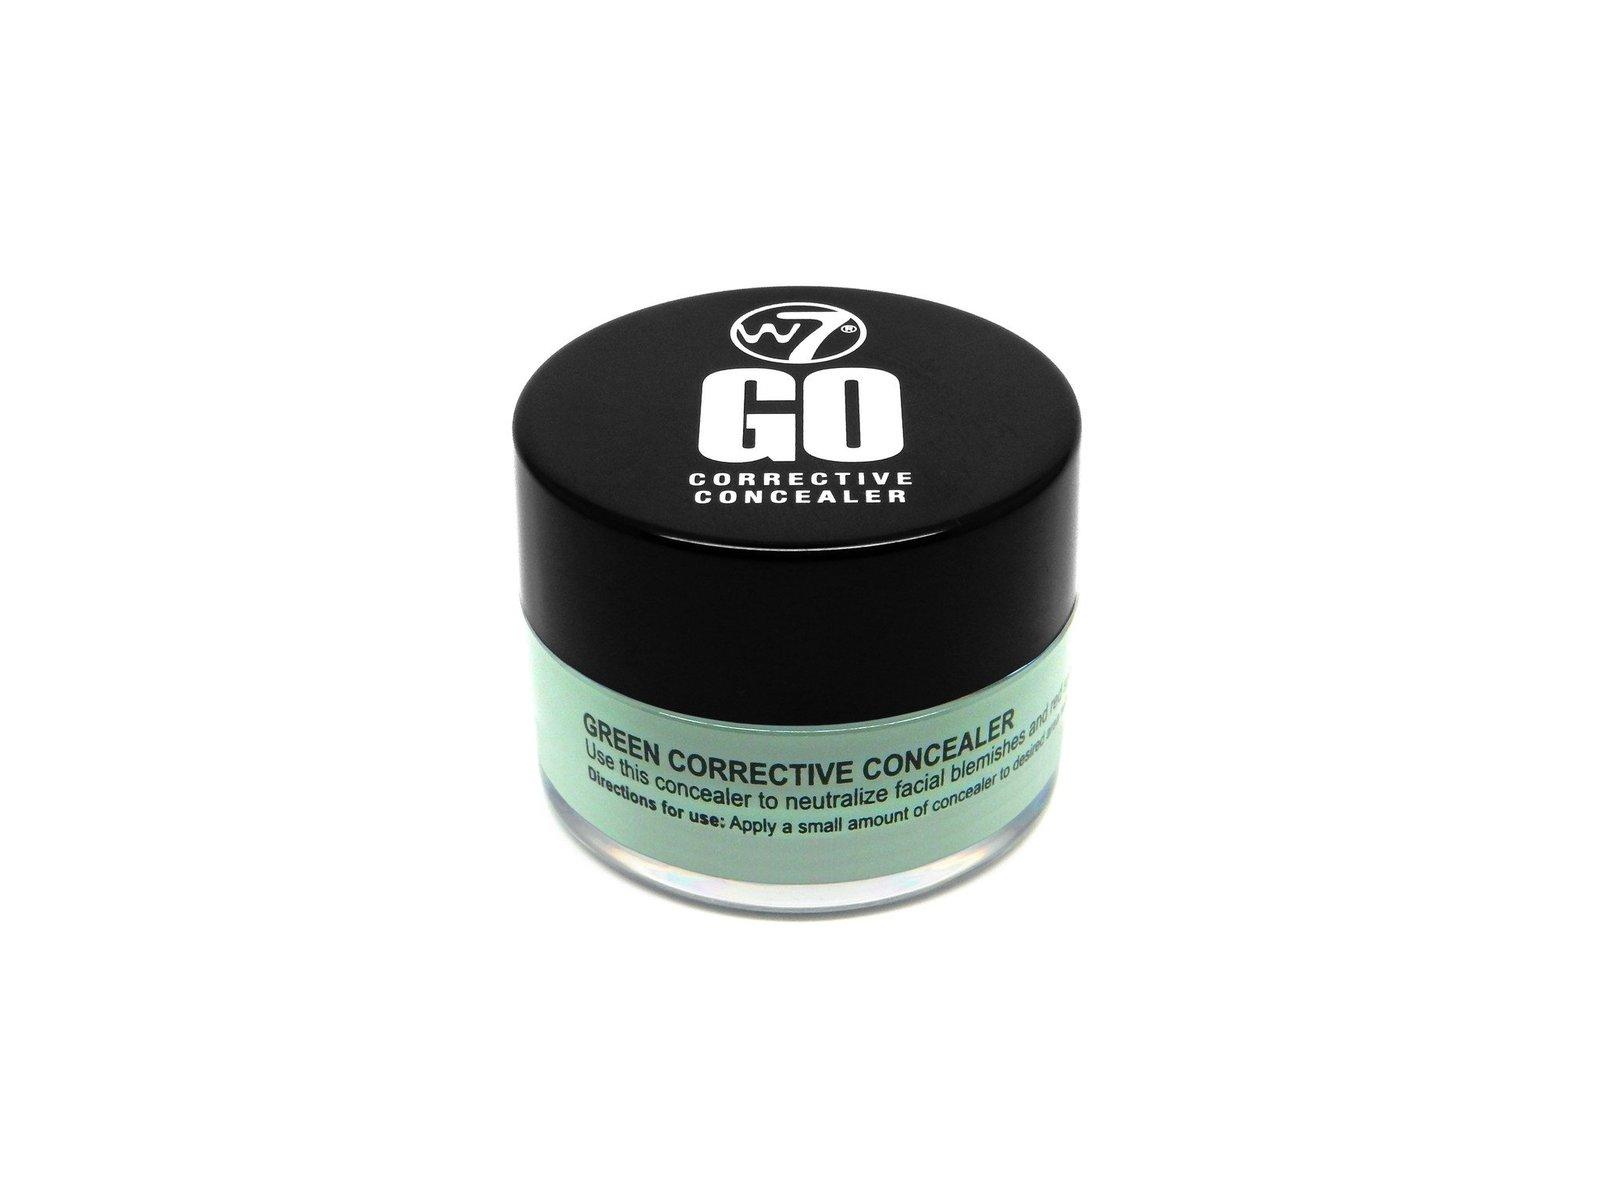 W7 Go Corrective Concealer (Green) image